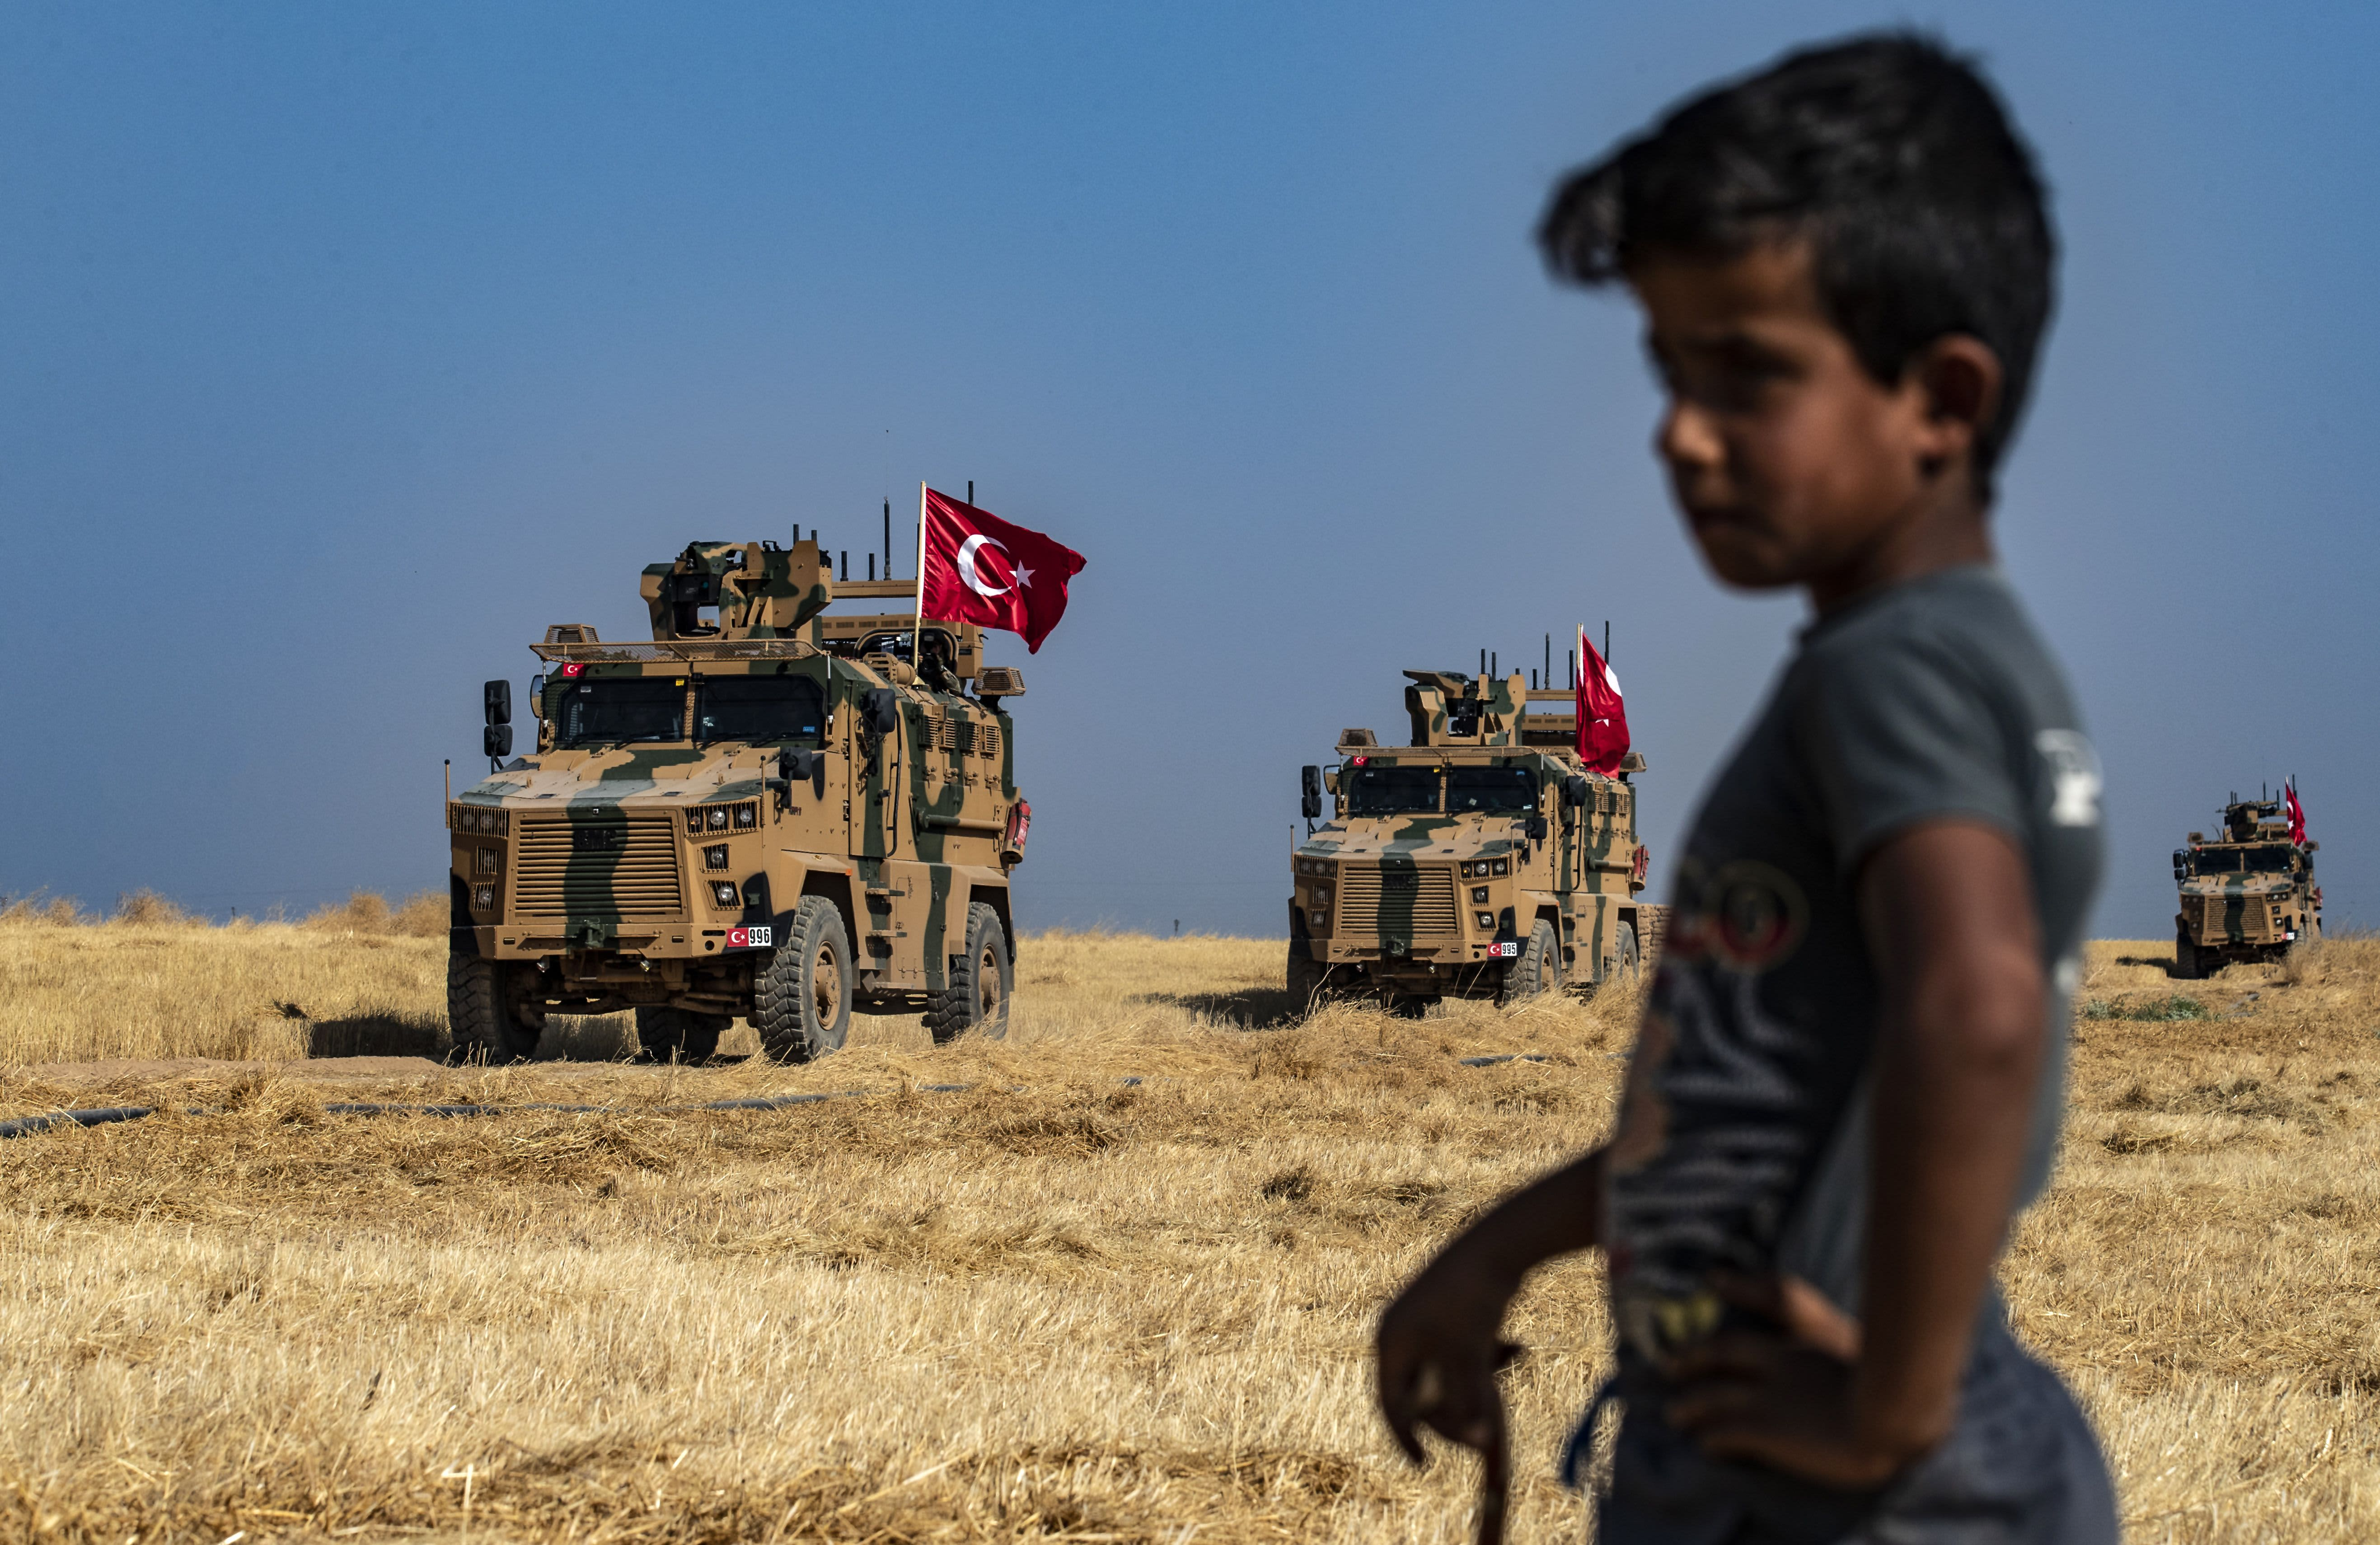 Turkish President Erdogan confirms military operation in northern Syria has begun